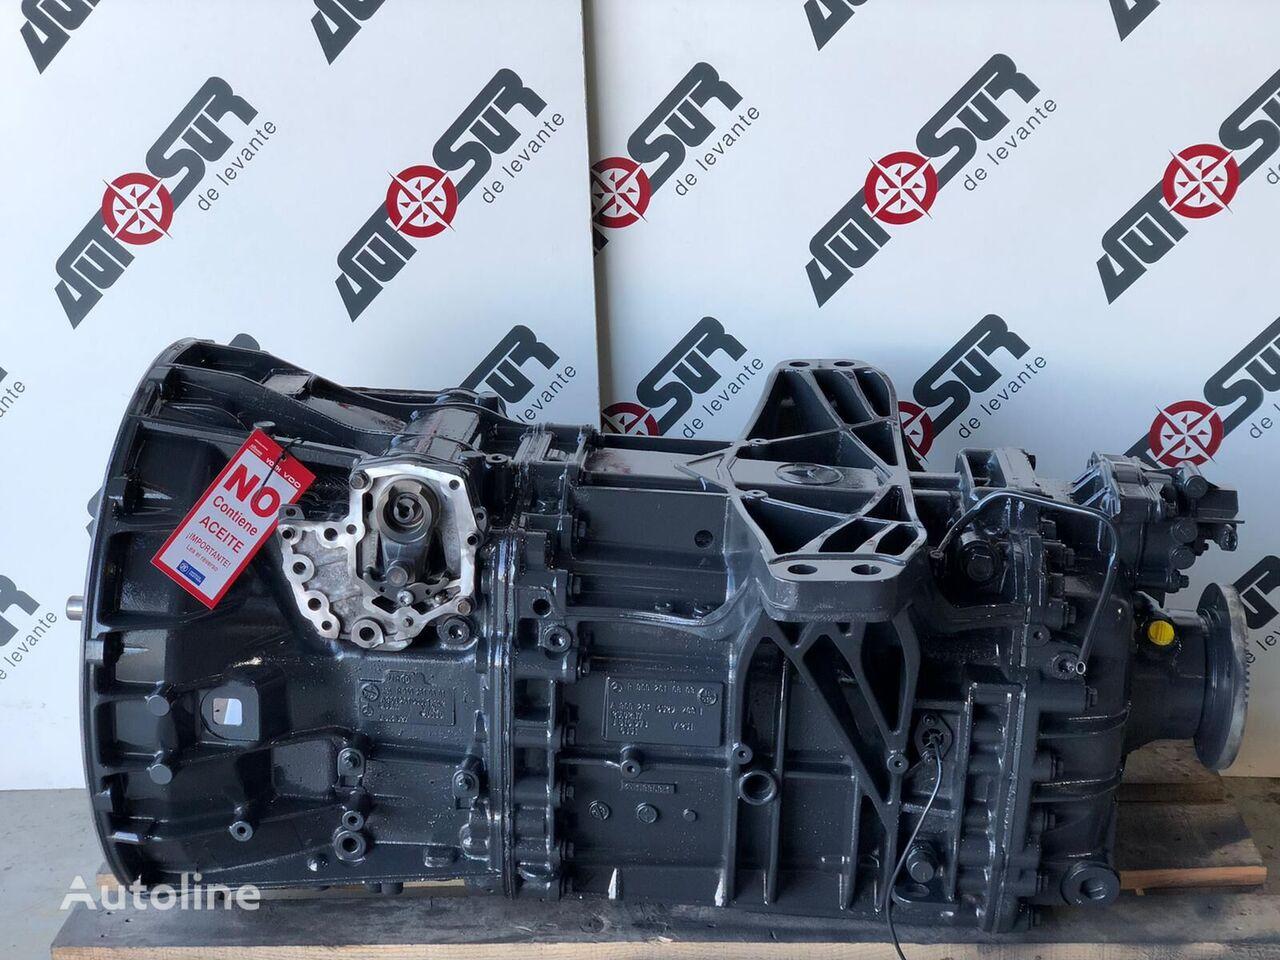 КПП MERCEDES-BENZ 715.352 (715.352) для грузовика MERCEDES-BENZ